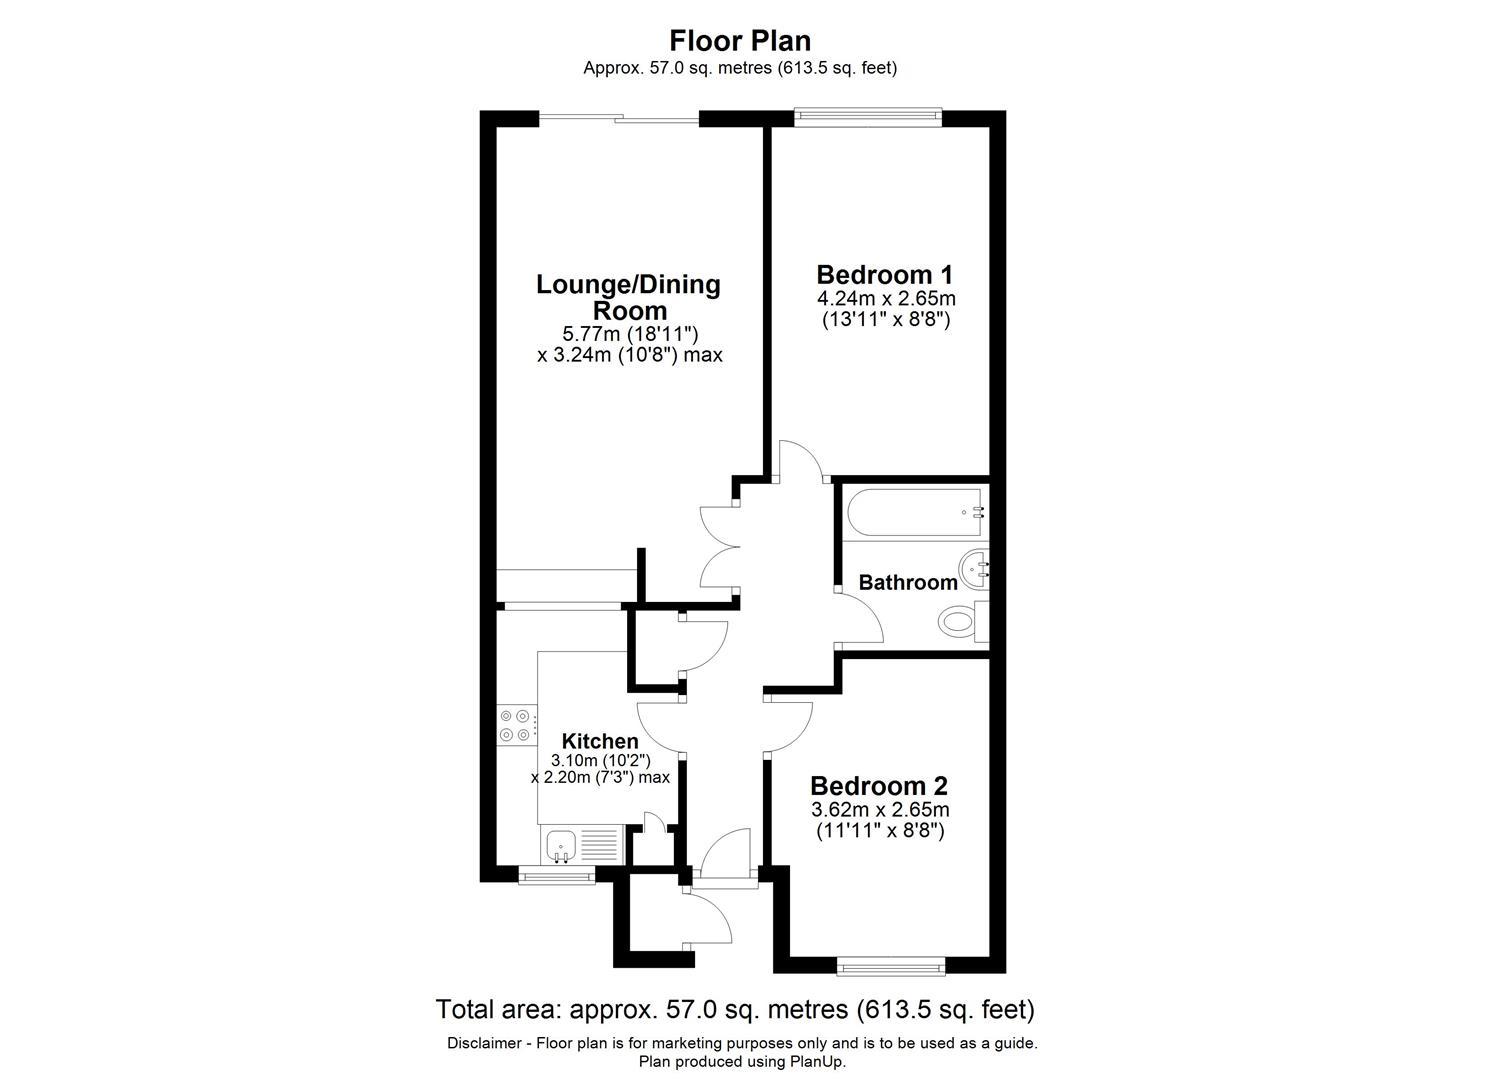 3_-Kite-Field_-BERKHAMSTED-  floor plan.jpg